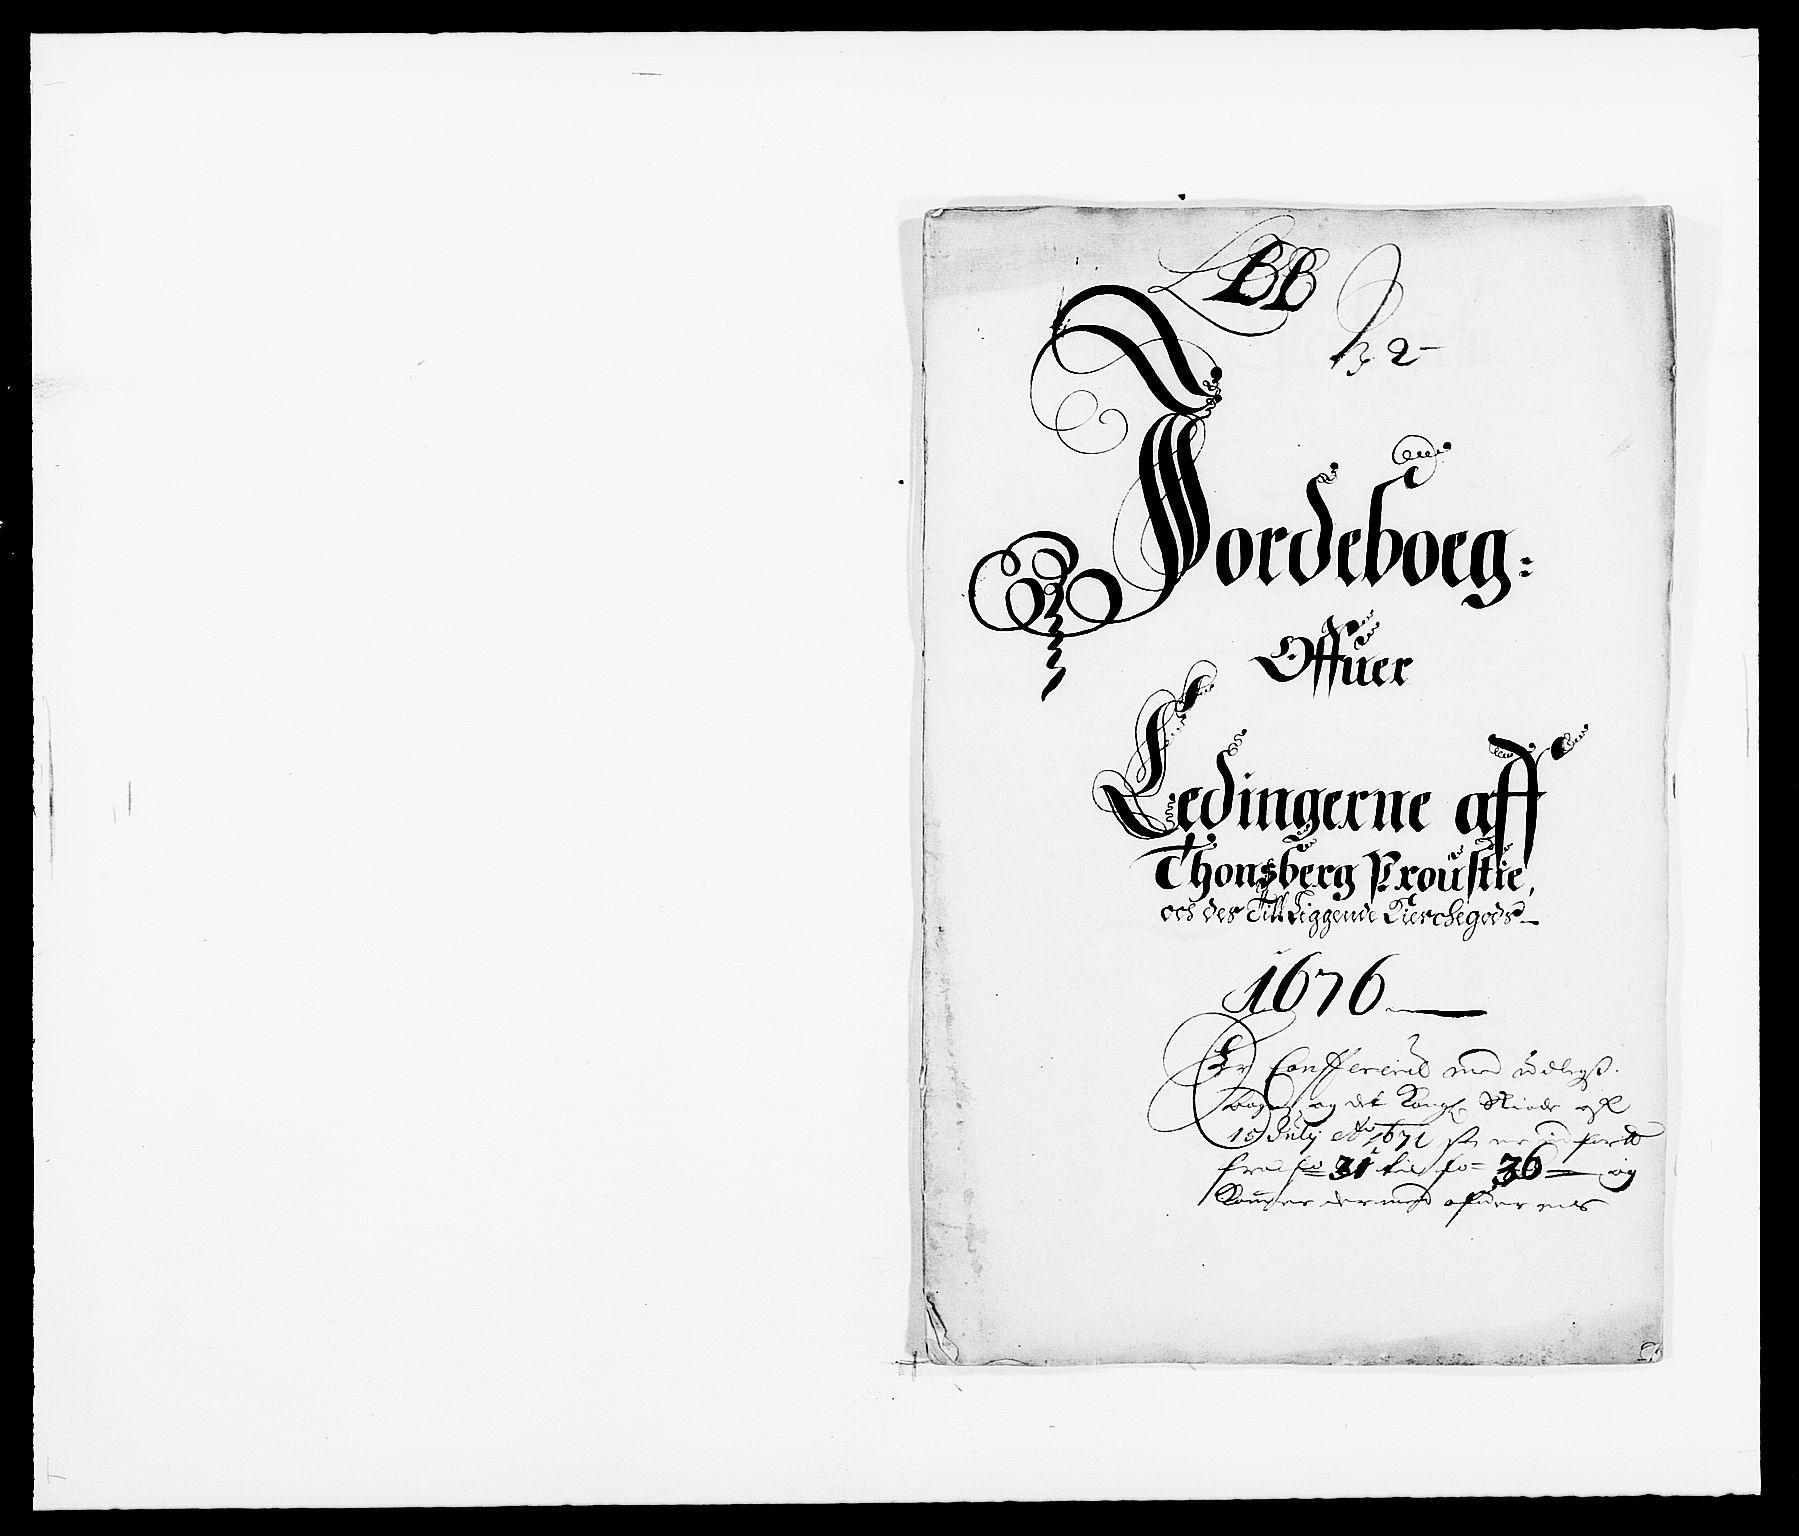 RA, Rentekammeret inntil 1814, Reviderte regnskaper, Fogderegnskap, R32/L1845: Fogderegnskap Jarlsberg grevskap, 1676-1678, s. 97